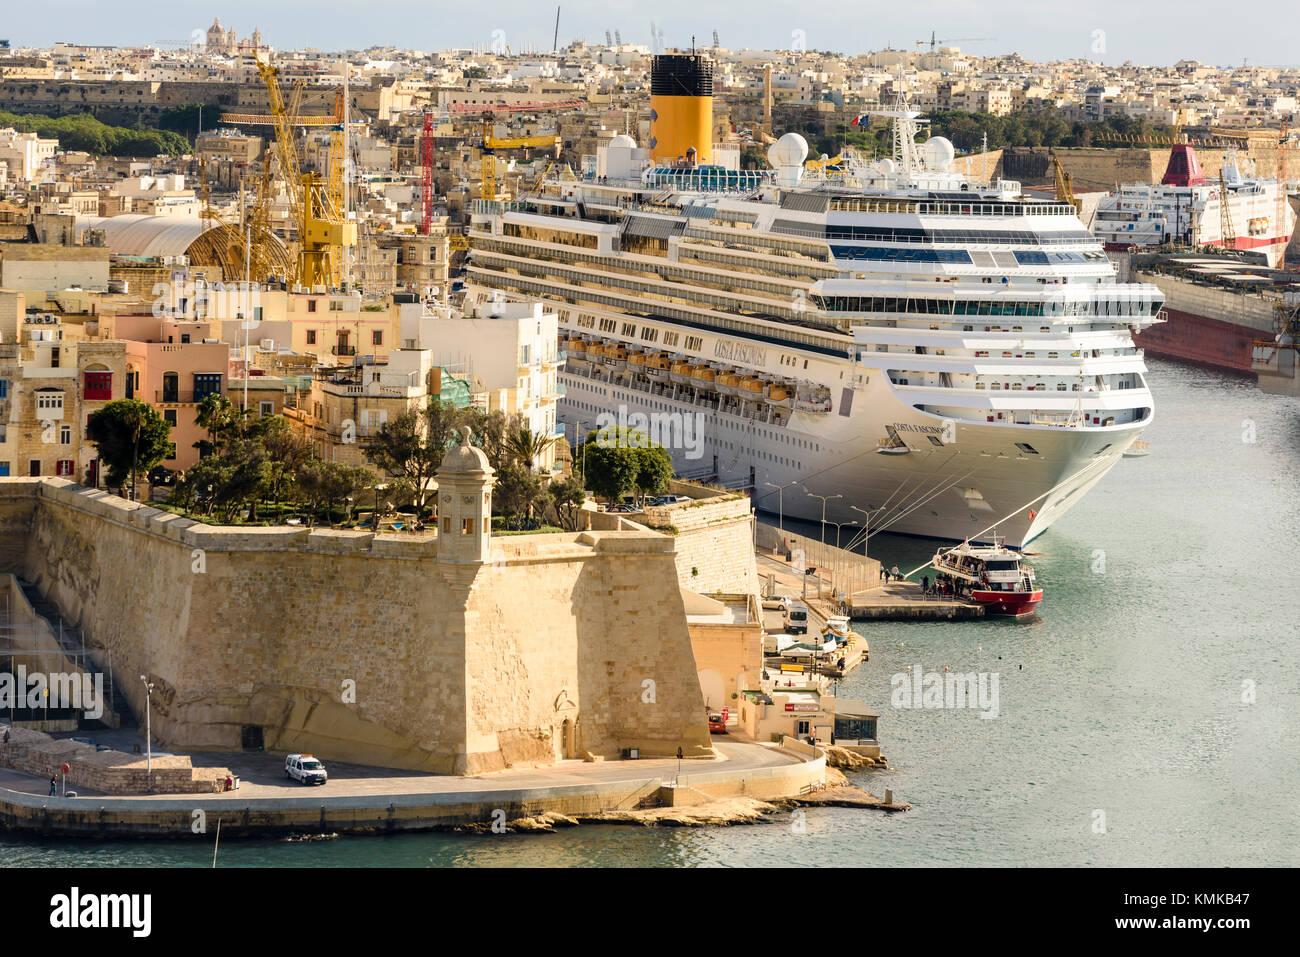 Cruise liner Costa Fascinosa in Valletta Harbour, Malta - Stock Image